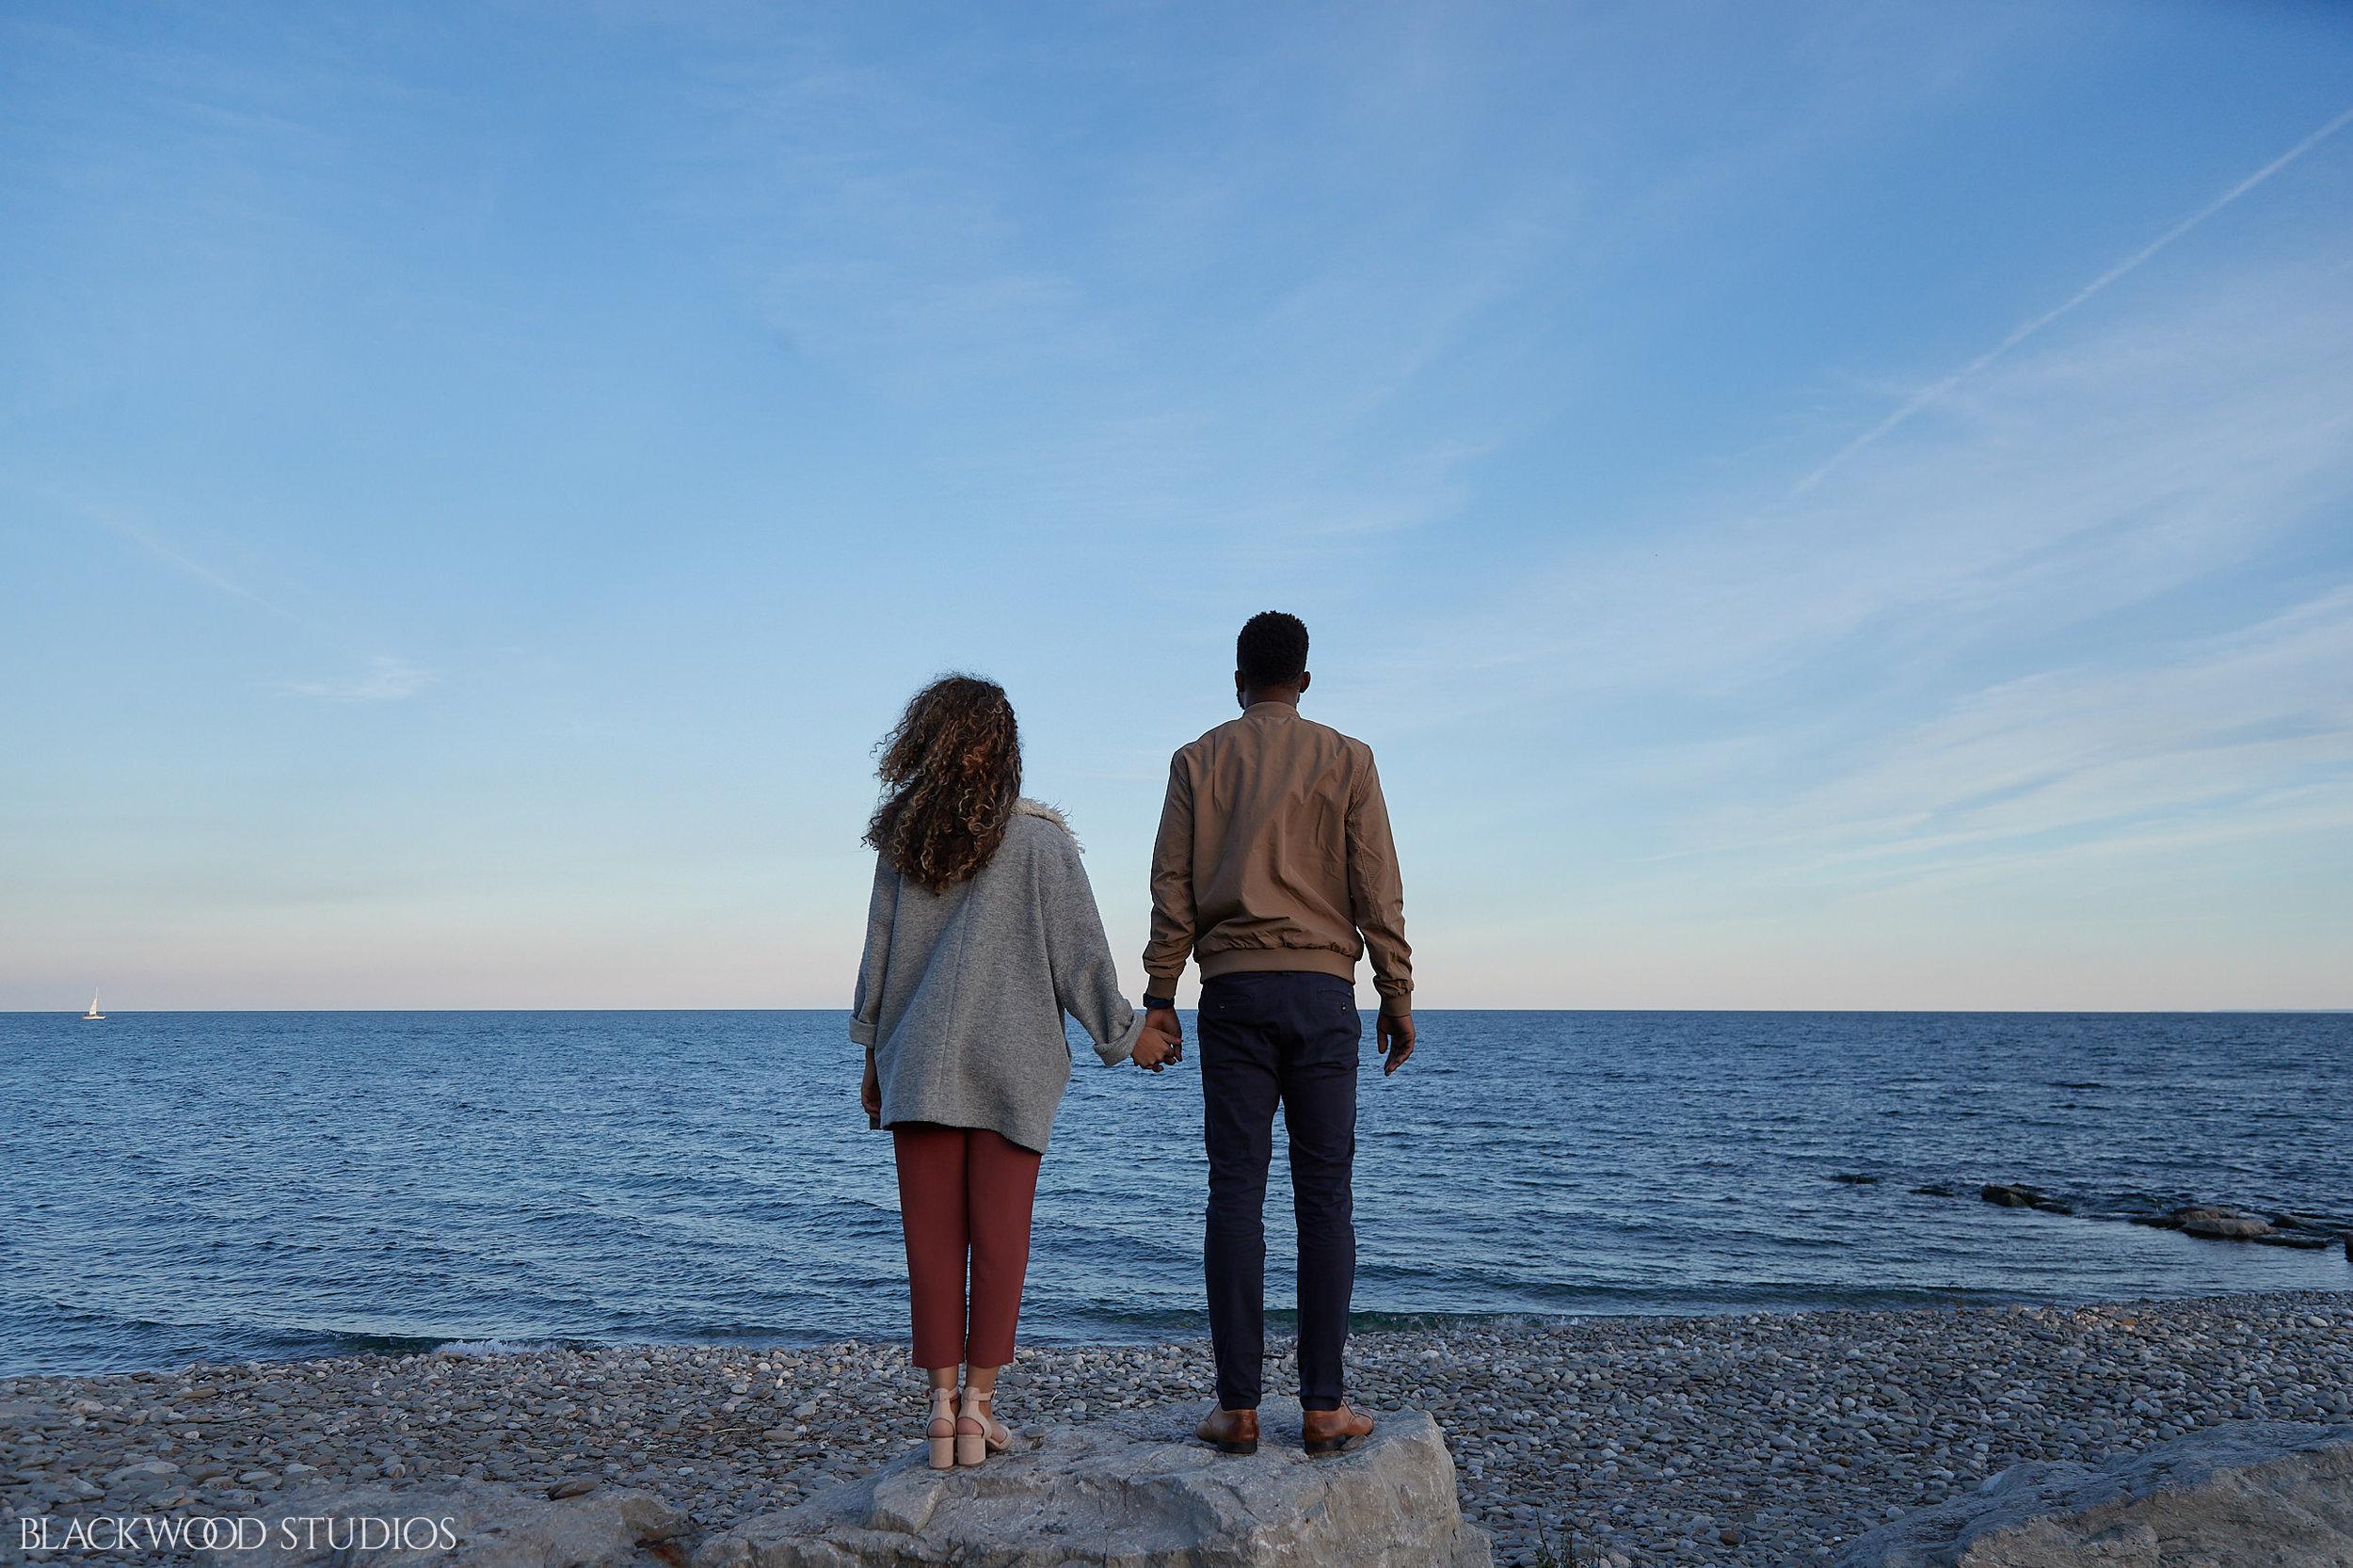 Blackwood-Studios-20181014-180855-Nader-and-Rayane-Engagement-photography-Lakeside-Park-Oakville-Ontario-Canada.jpg